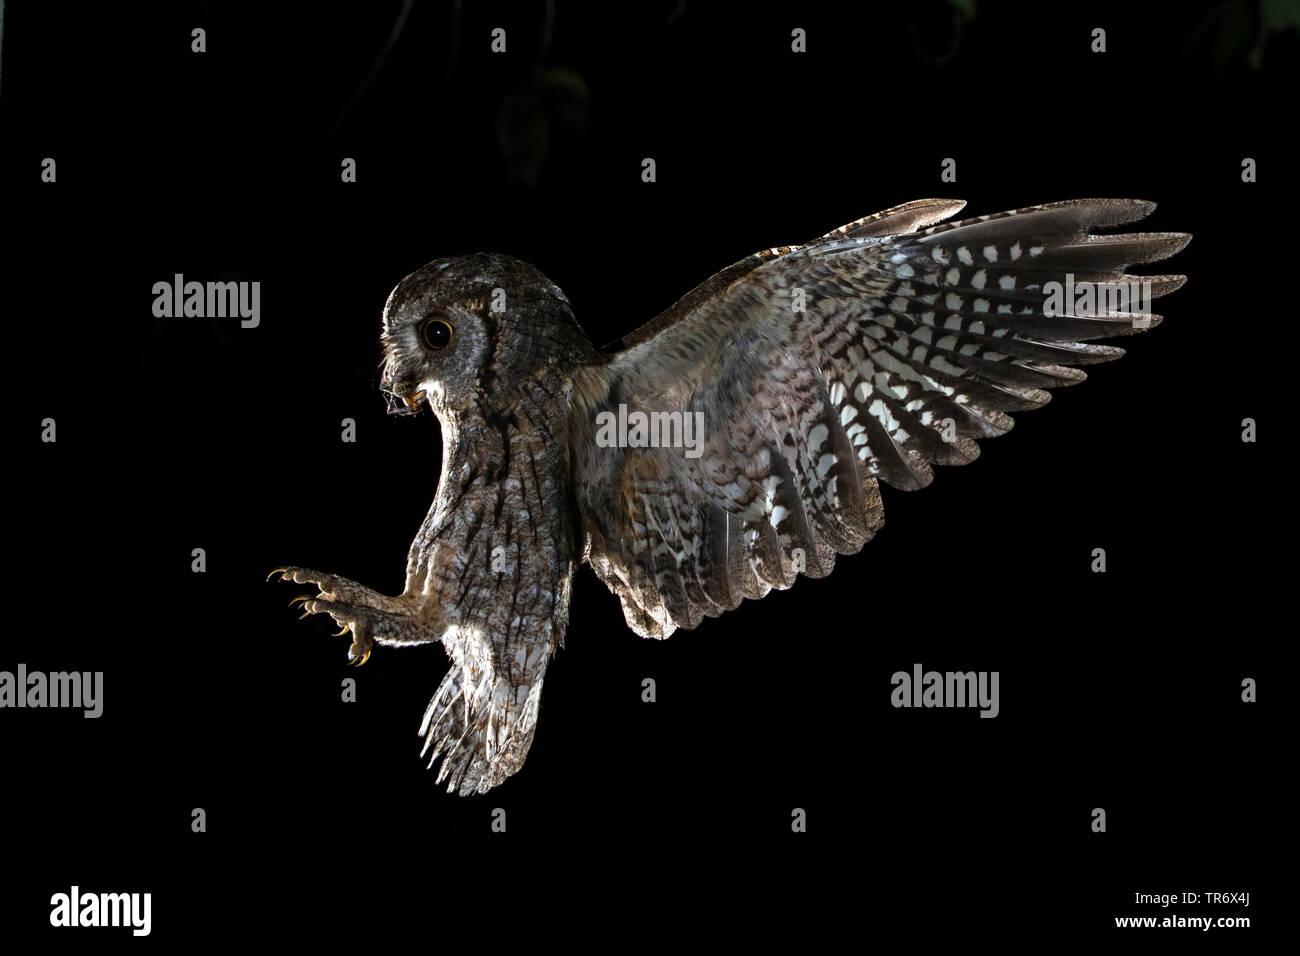 Zwergohreule, Zwergohr-Eule (Otus scops), im Landeanflug, Spanien, Guadarrama Nationalpark | Eurasian scops owl (Otus scops), on approach, Spain, Guad - Stock Image